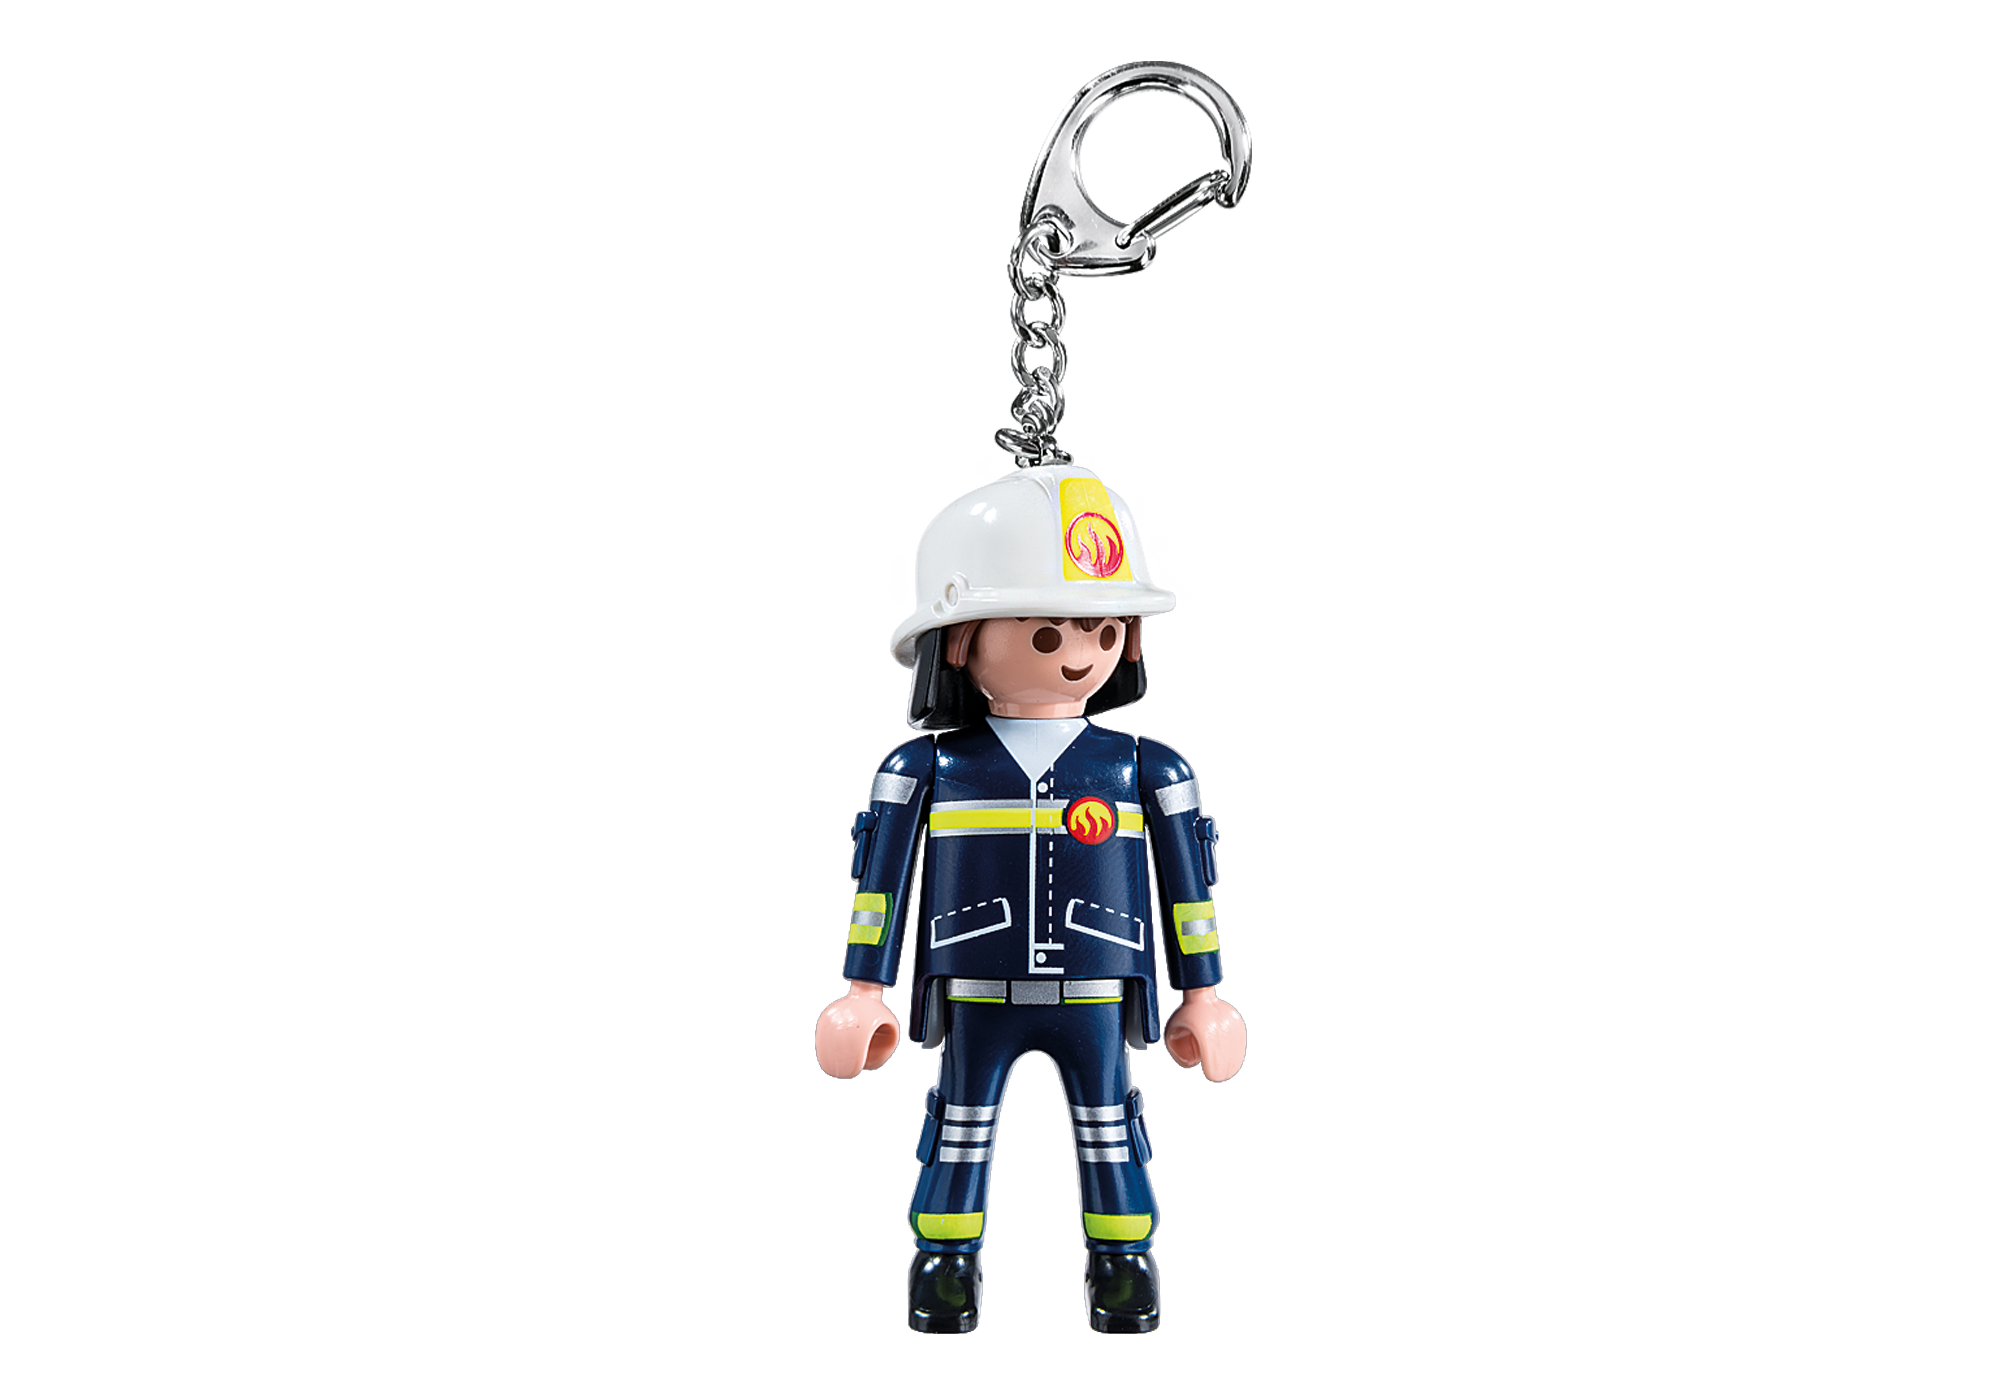 http://media.playmobil.com/i/playmobil/6569_product_detail/Schlüsselanhänger Feuerwehr